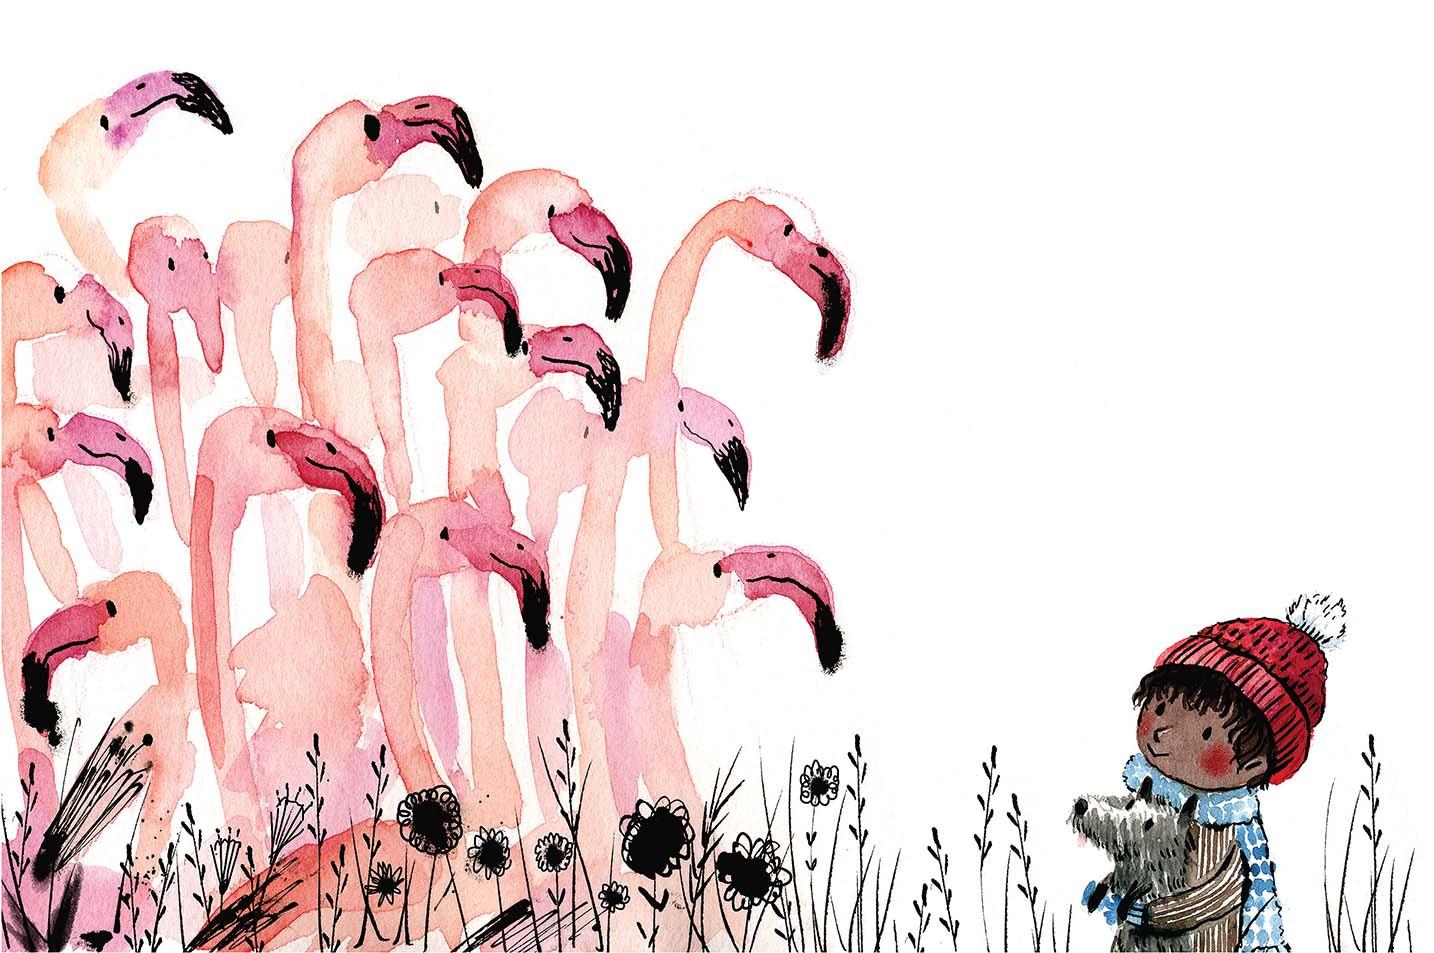 Flamans / Flamingos